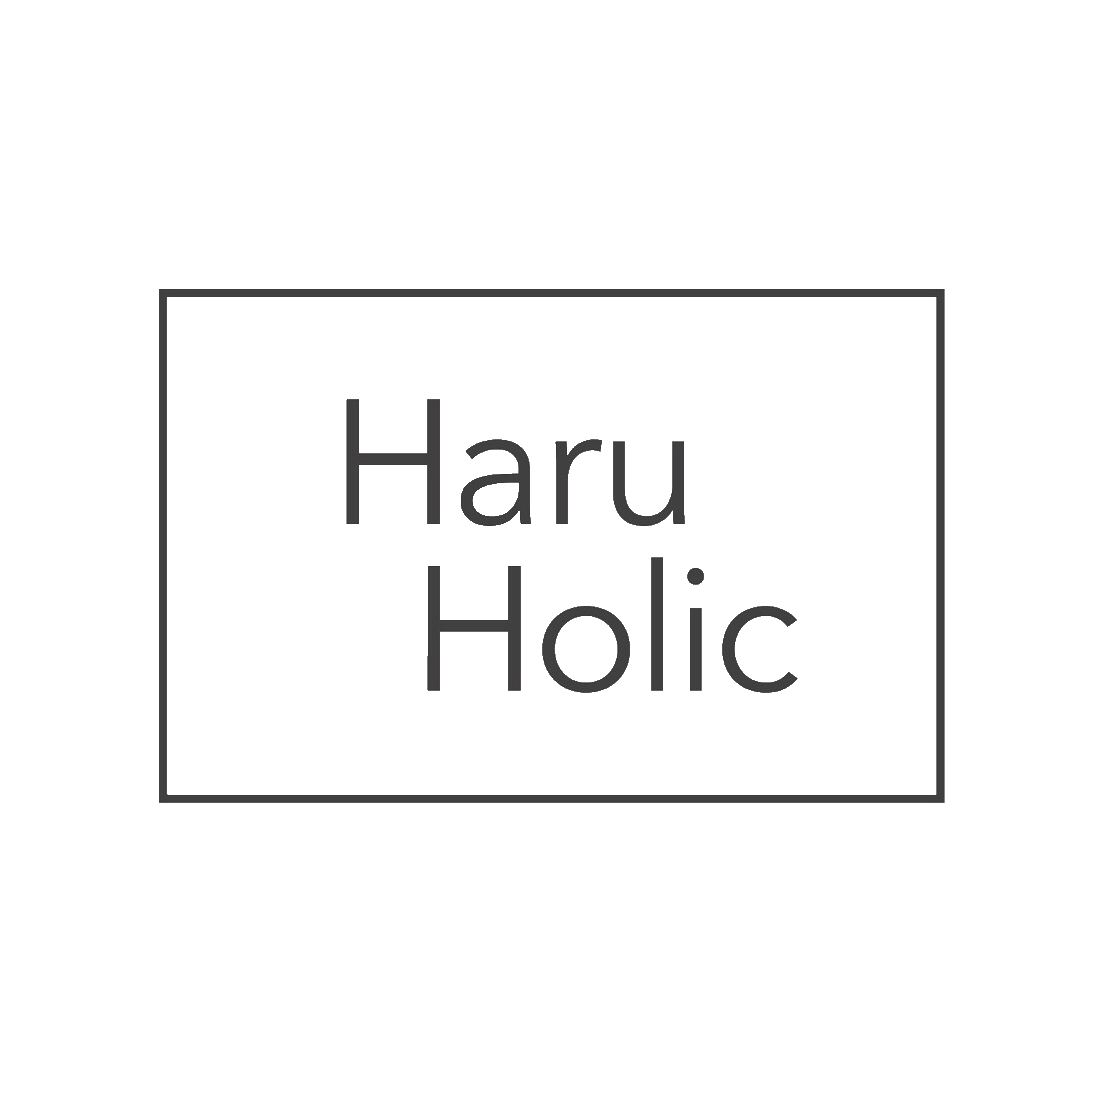 Haru Holic *ベビー服 子供服 * 5.15 新商品販売♩